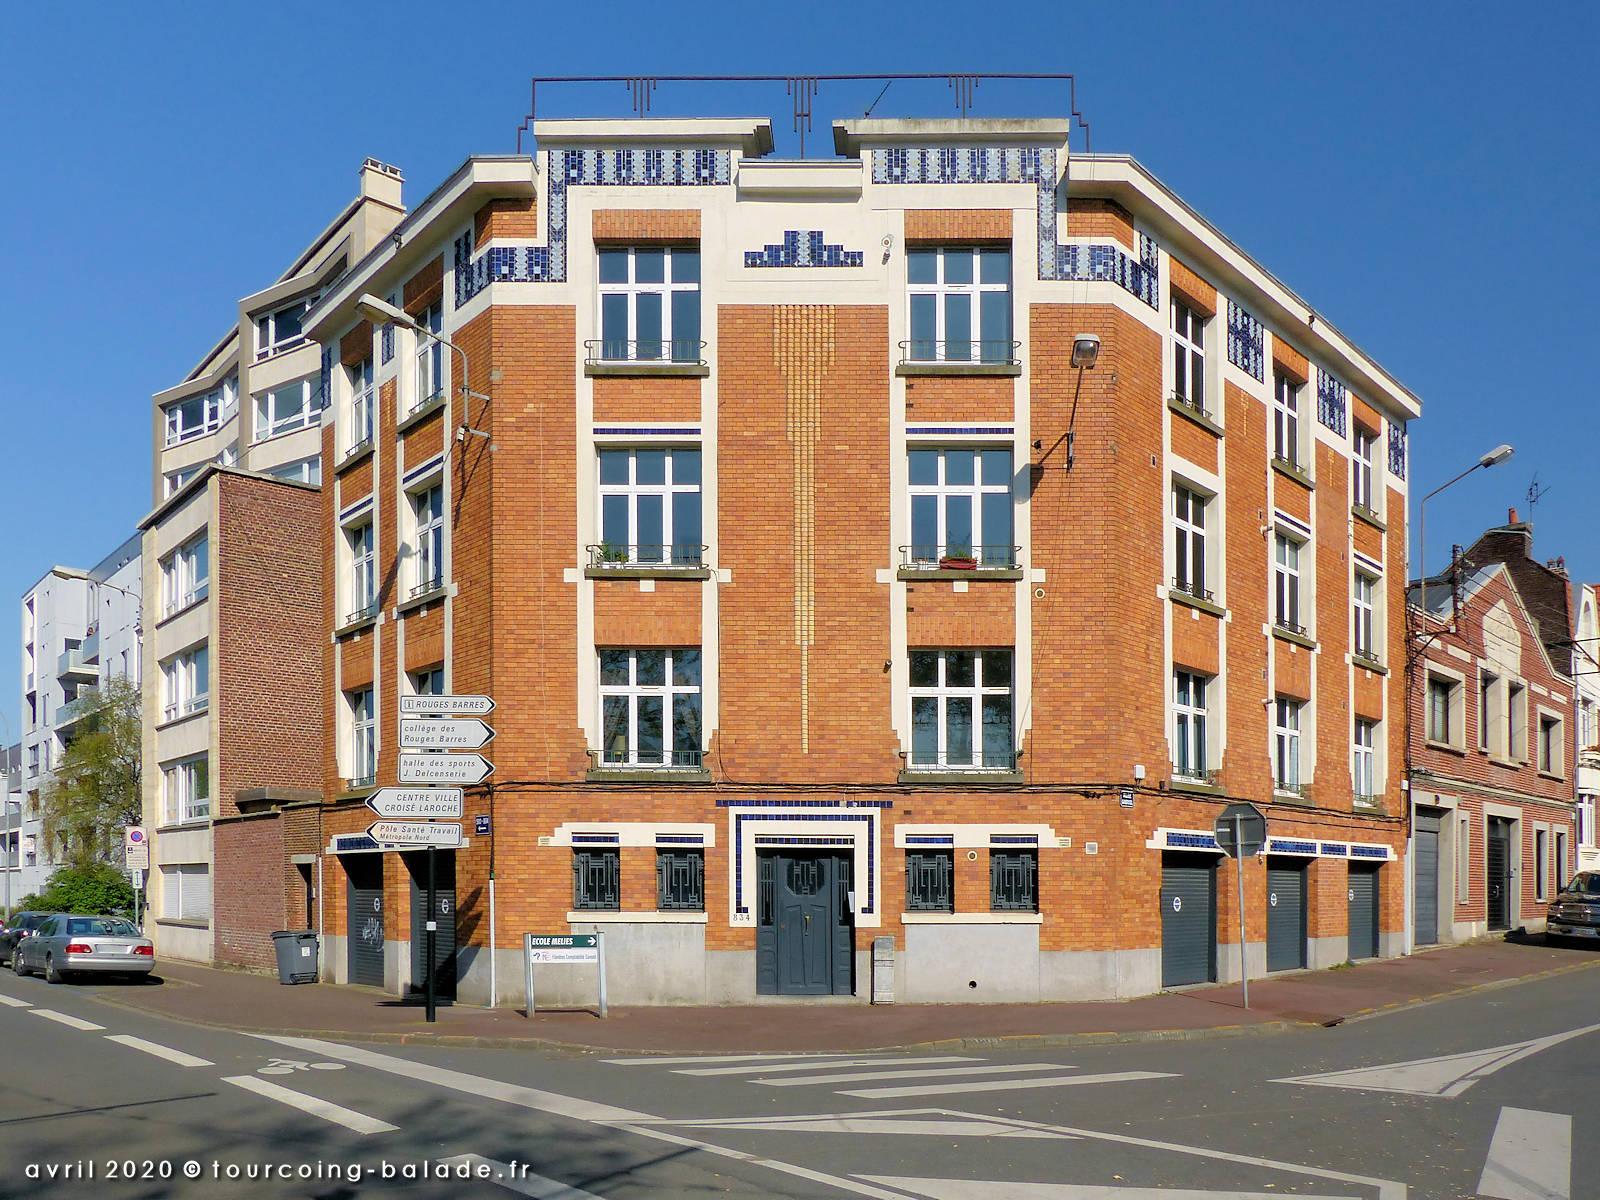 Immeuble style Art Déco, Marcq-en-Baroeul, 2020